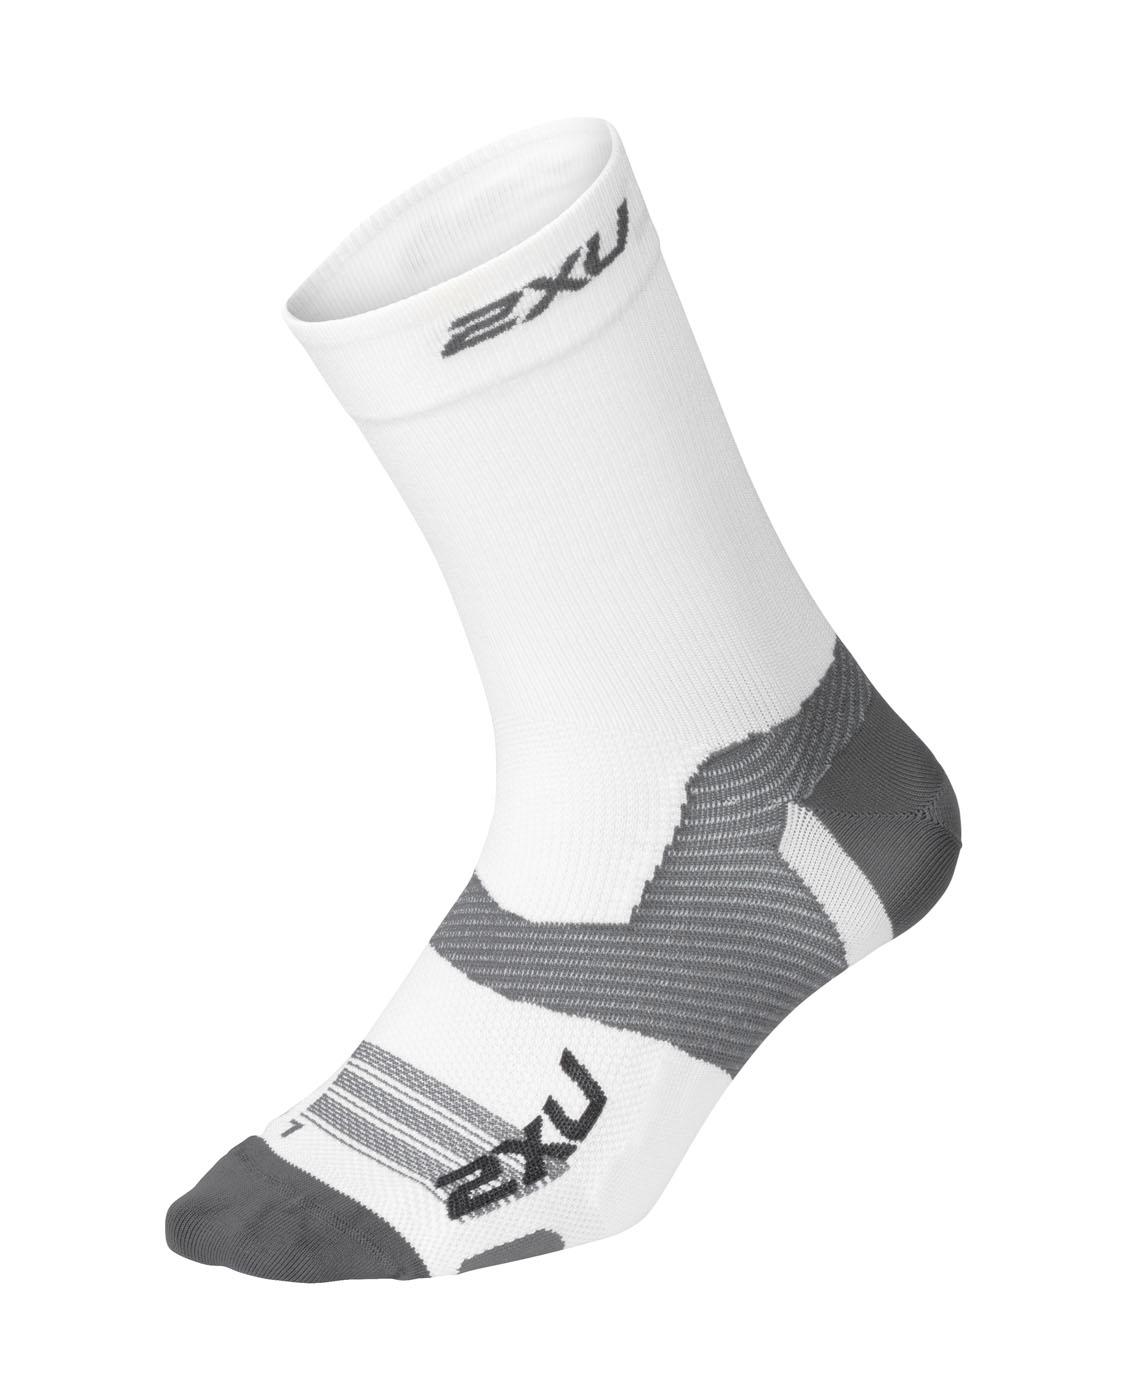 2XU Unisex Vectr Ultralight Crew Socks - White/Grey